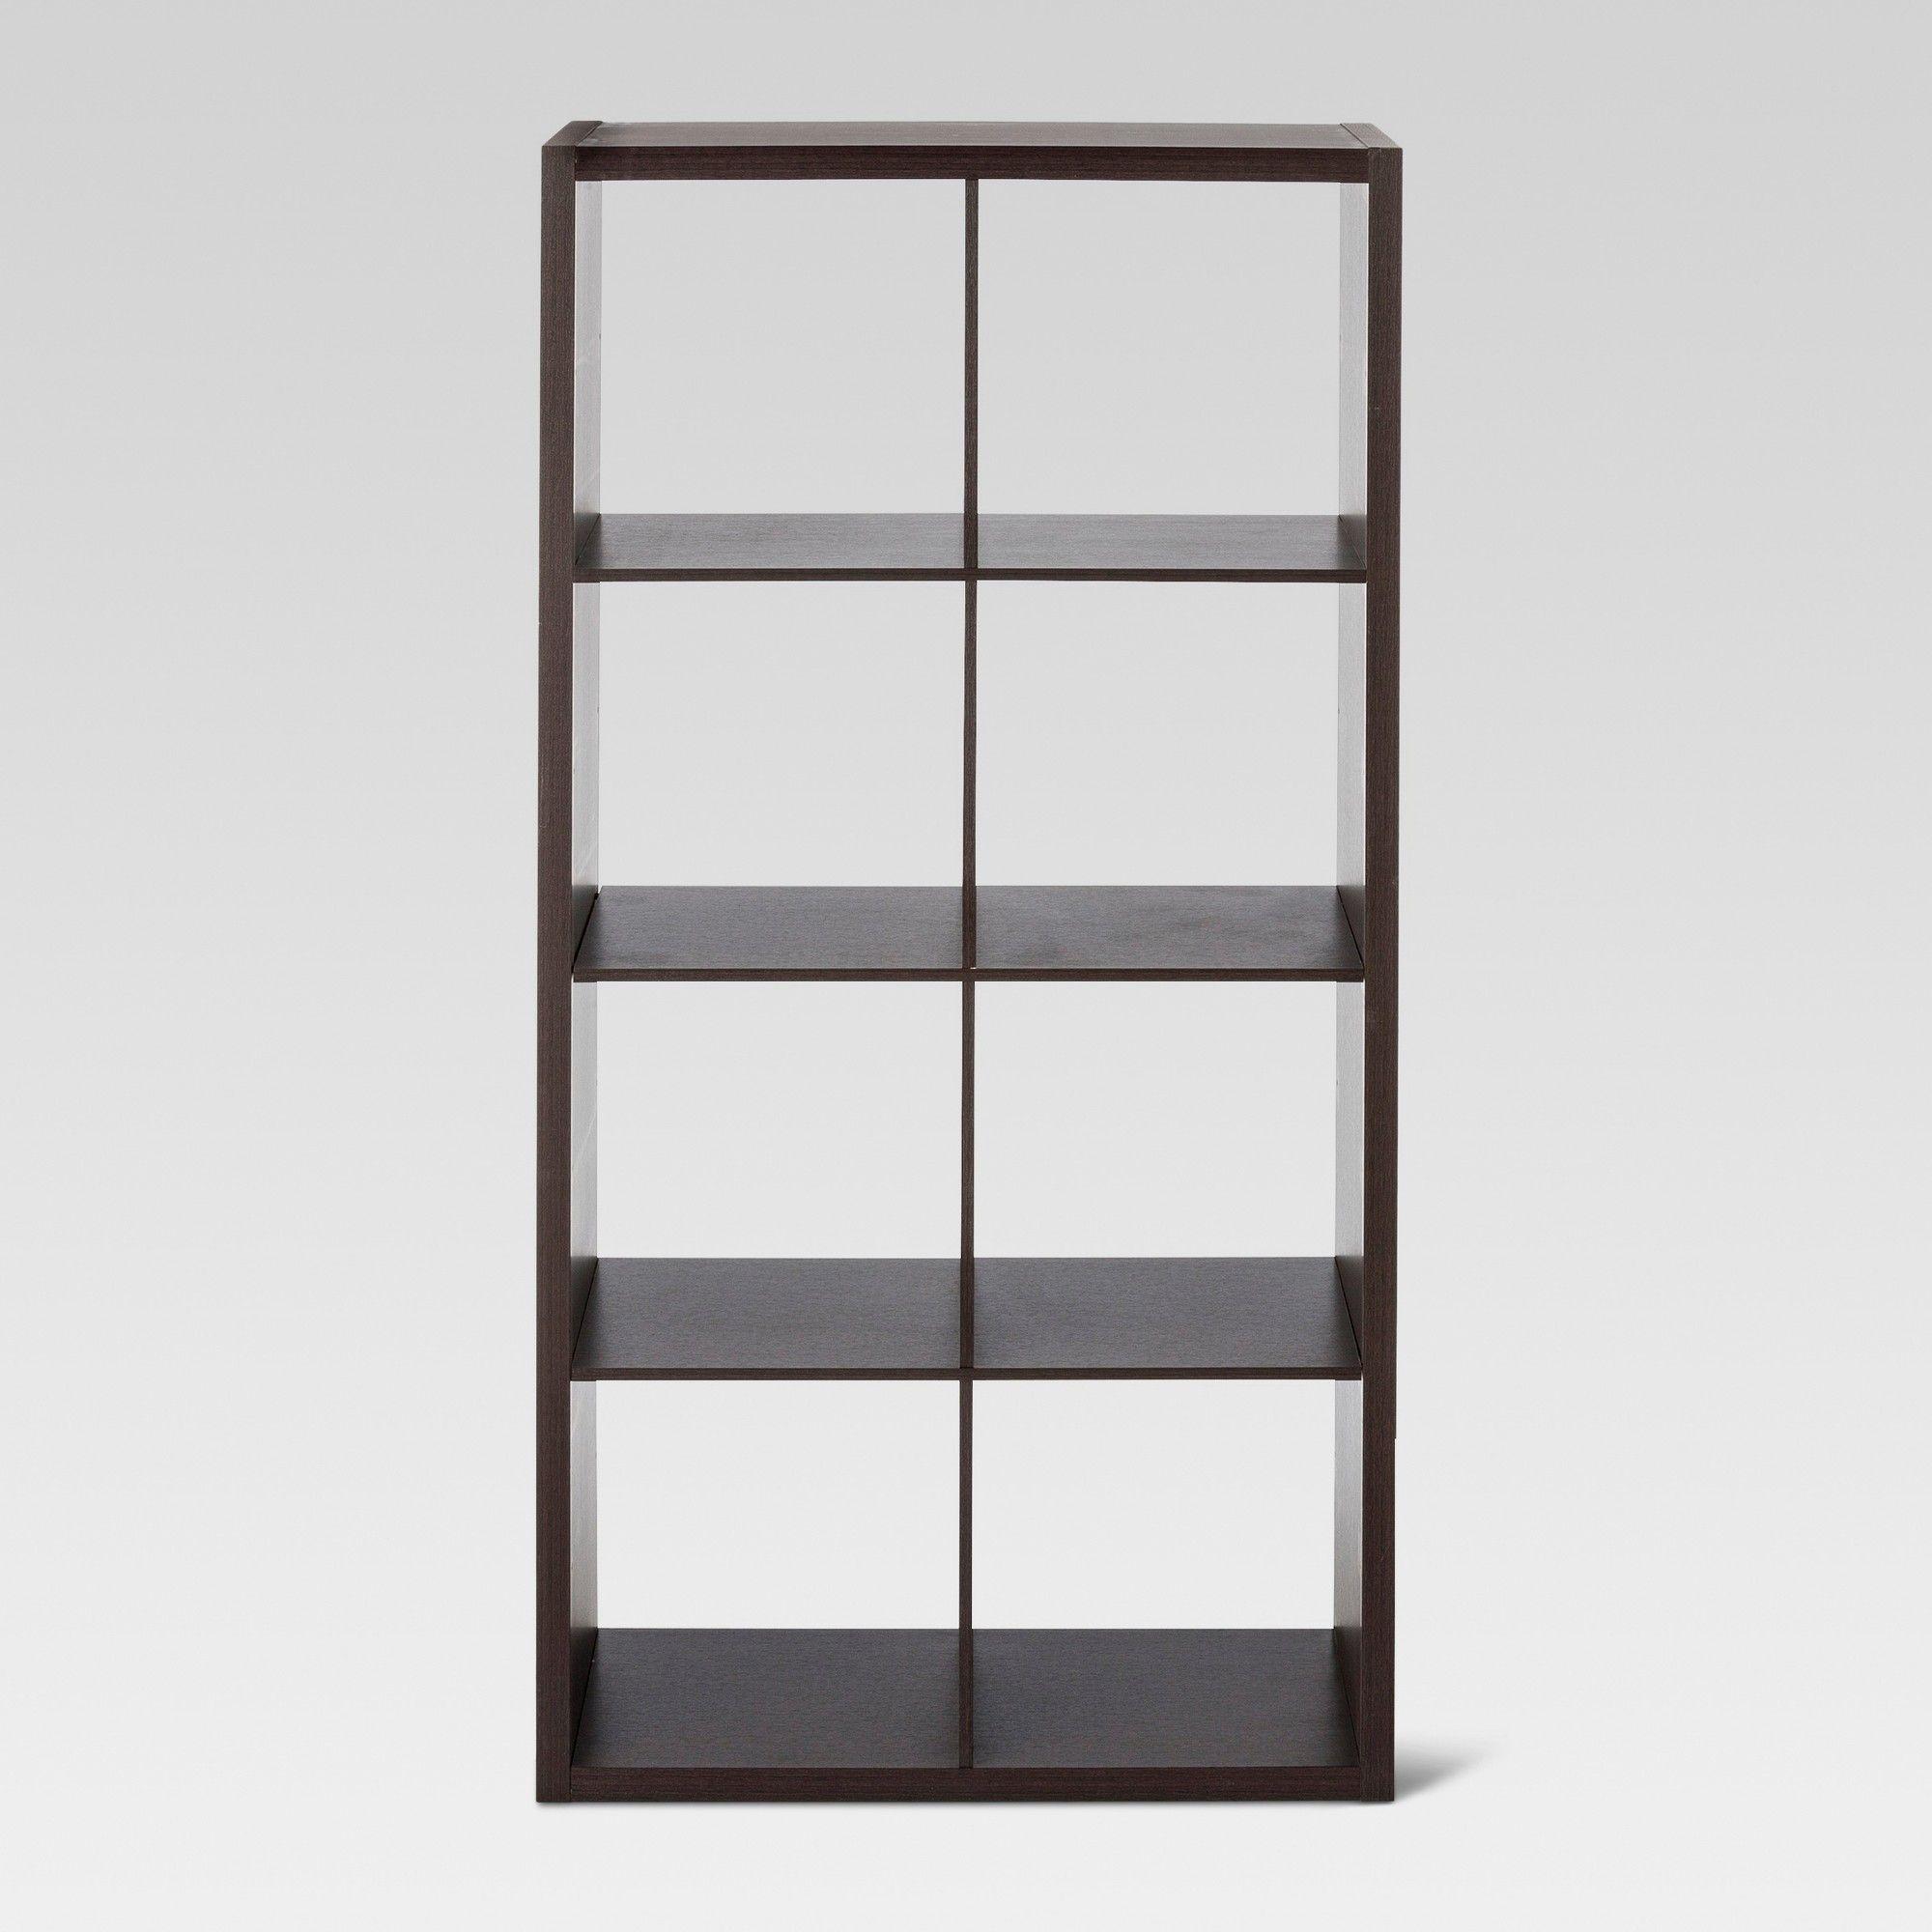 8 Cube Organizer Shelf Espresso 13 Threshold Avington Cube